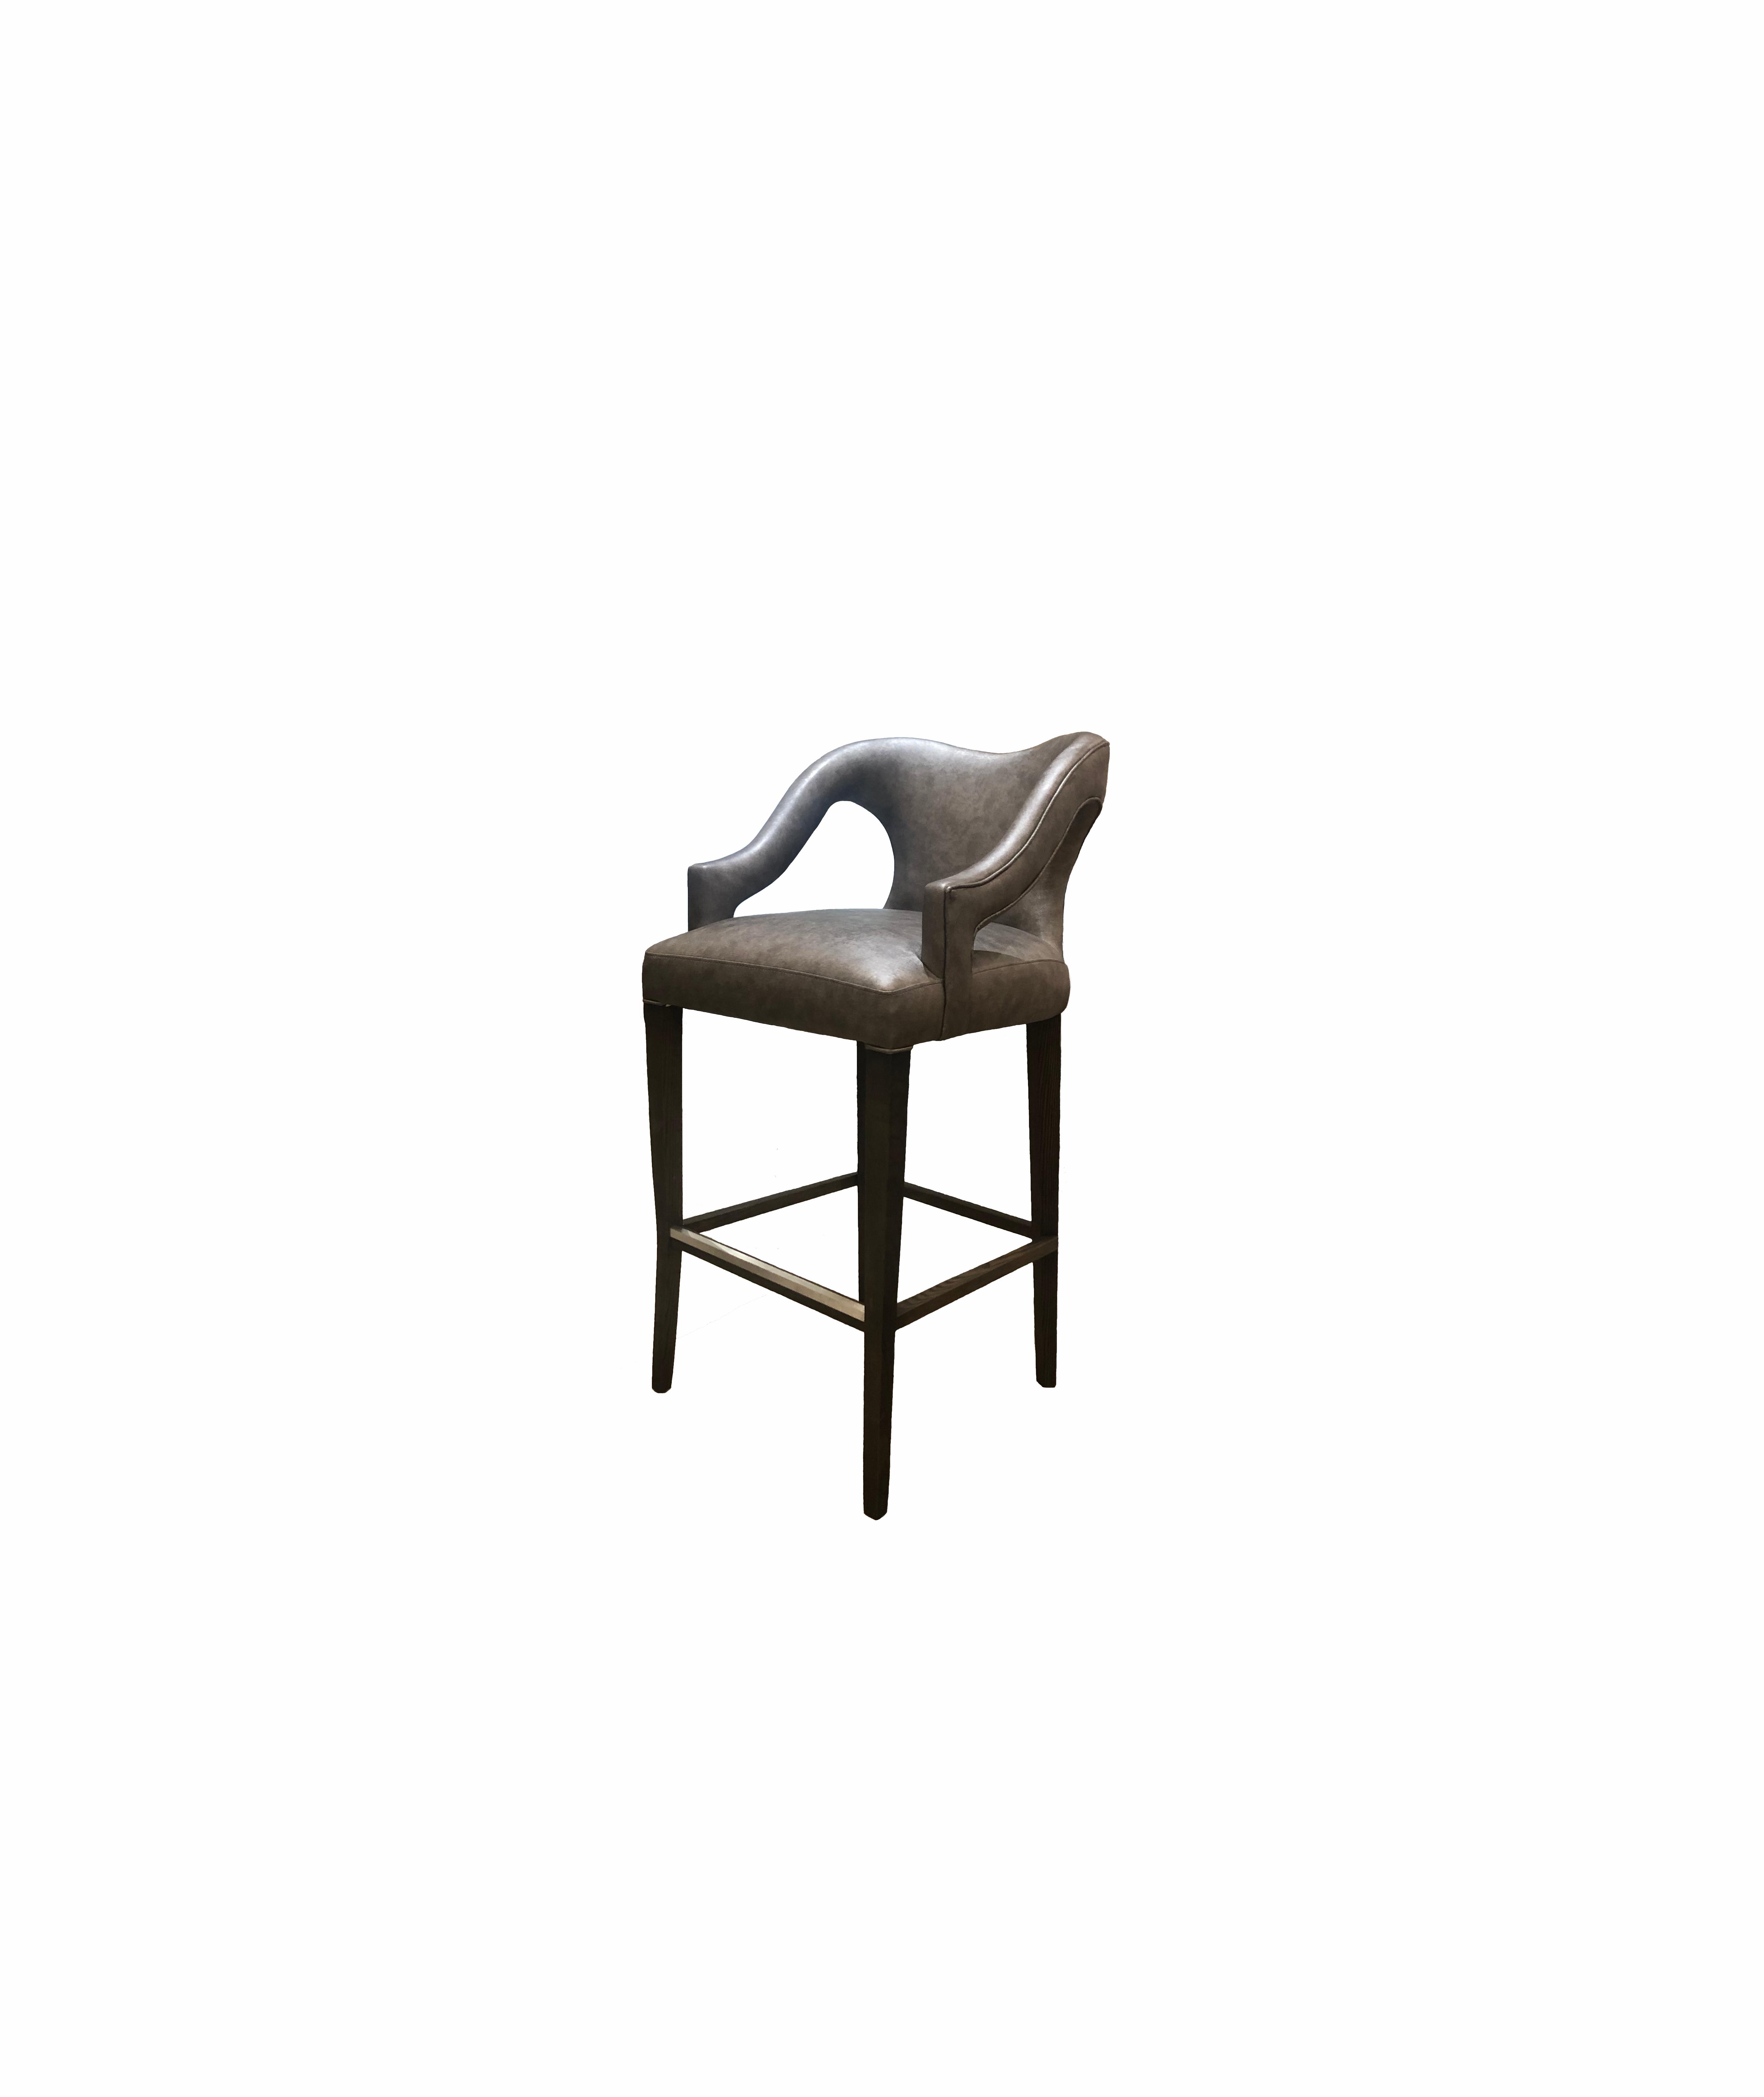 Zoey stool